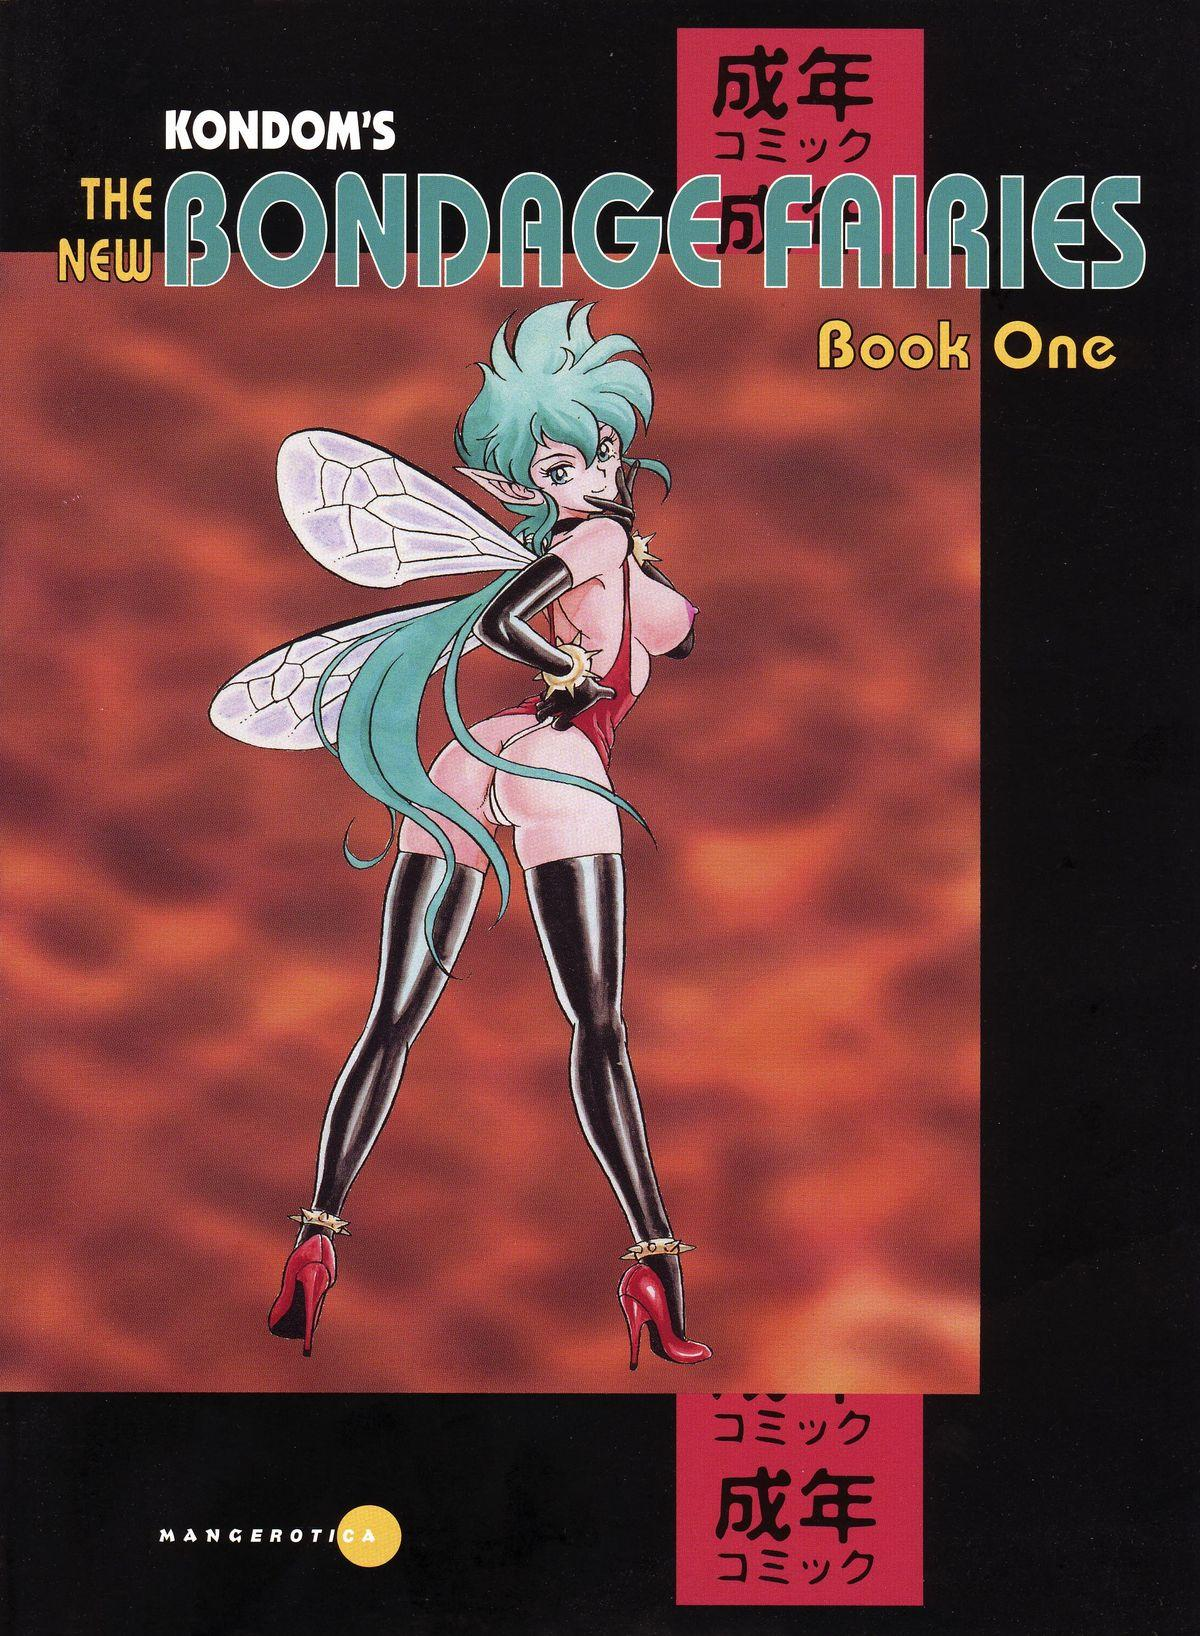 The New Bondage Fairies - Book One 0